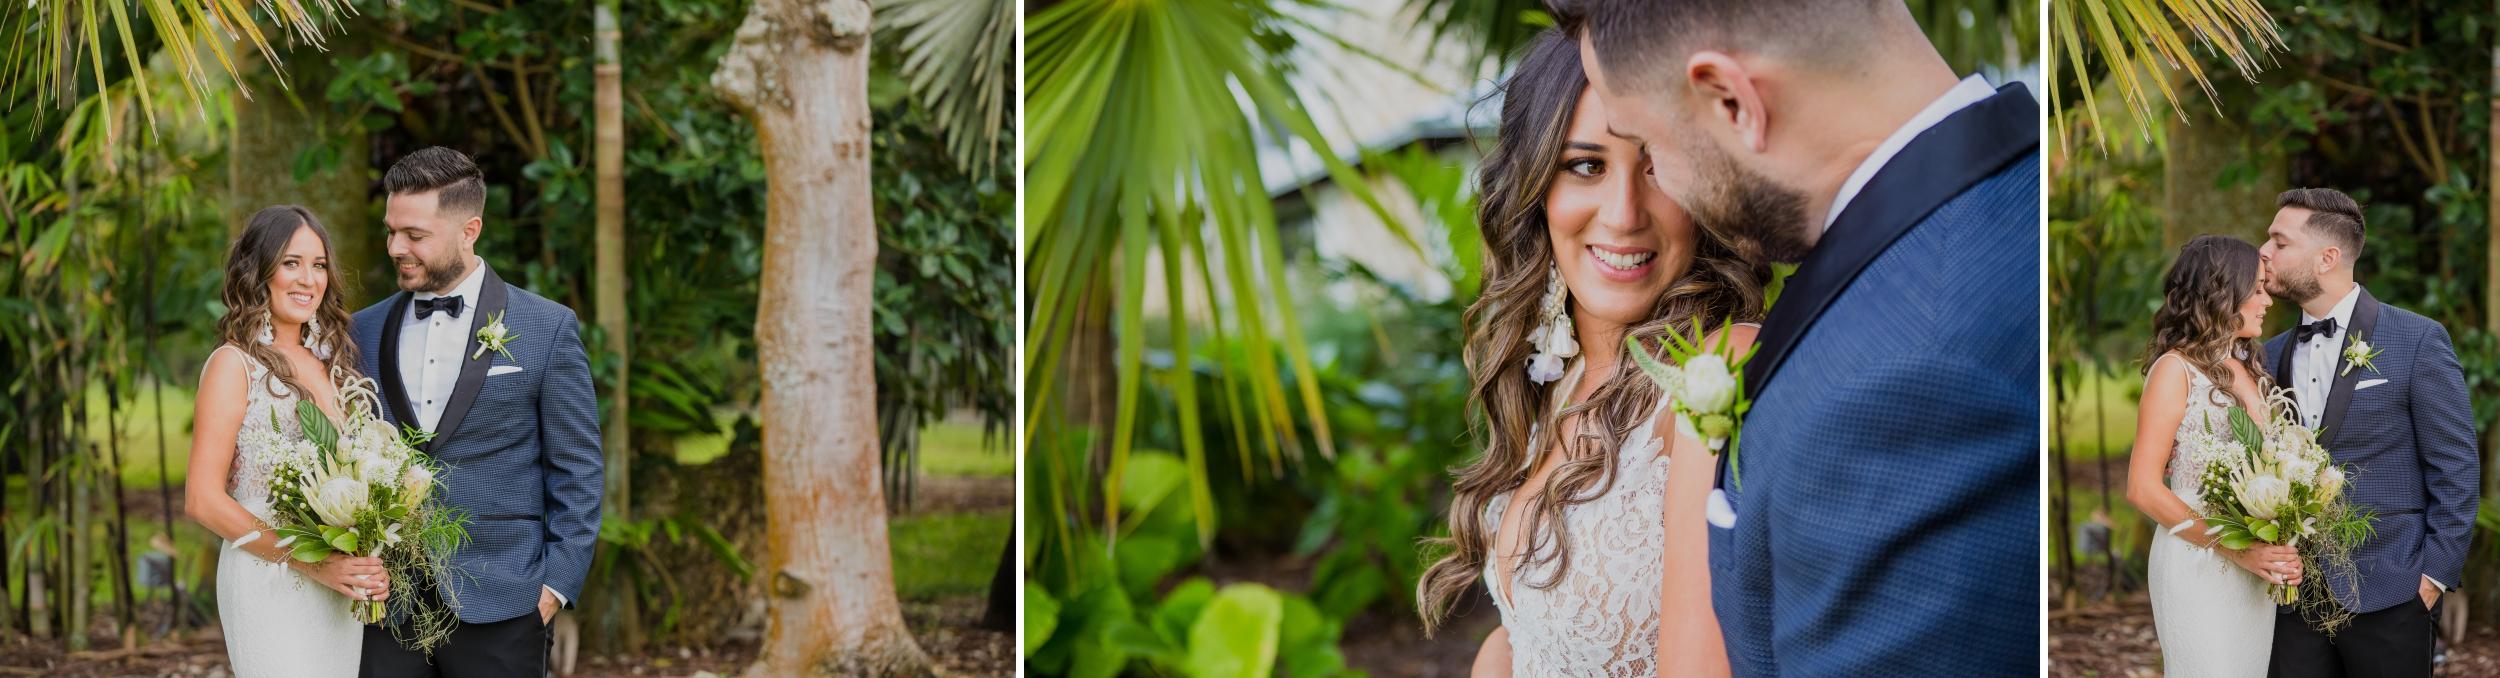 Wedding Whimsical Key West House  - Photography by Santy Martinez 6.jpg